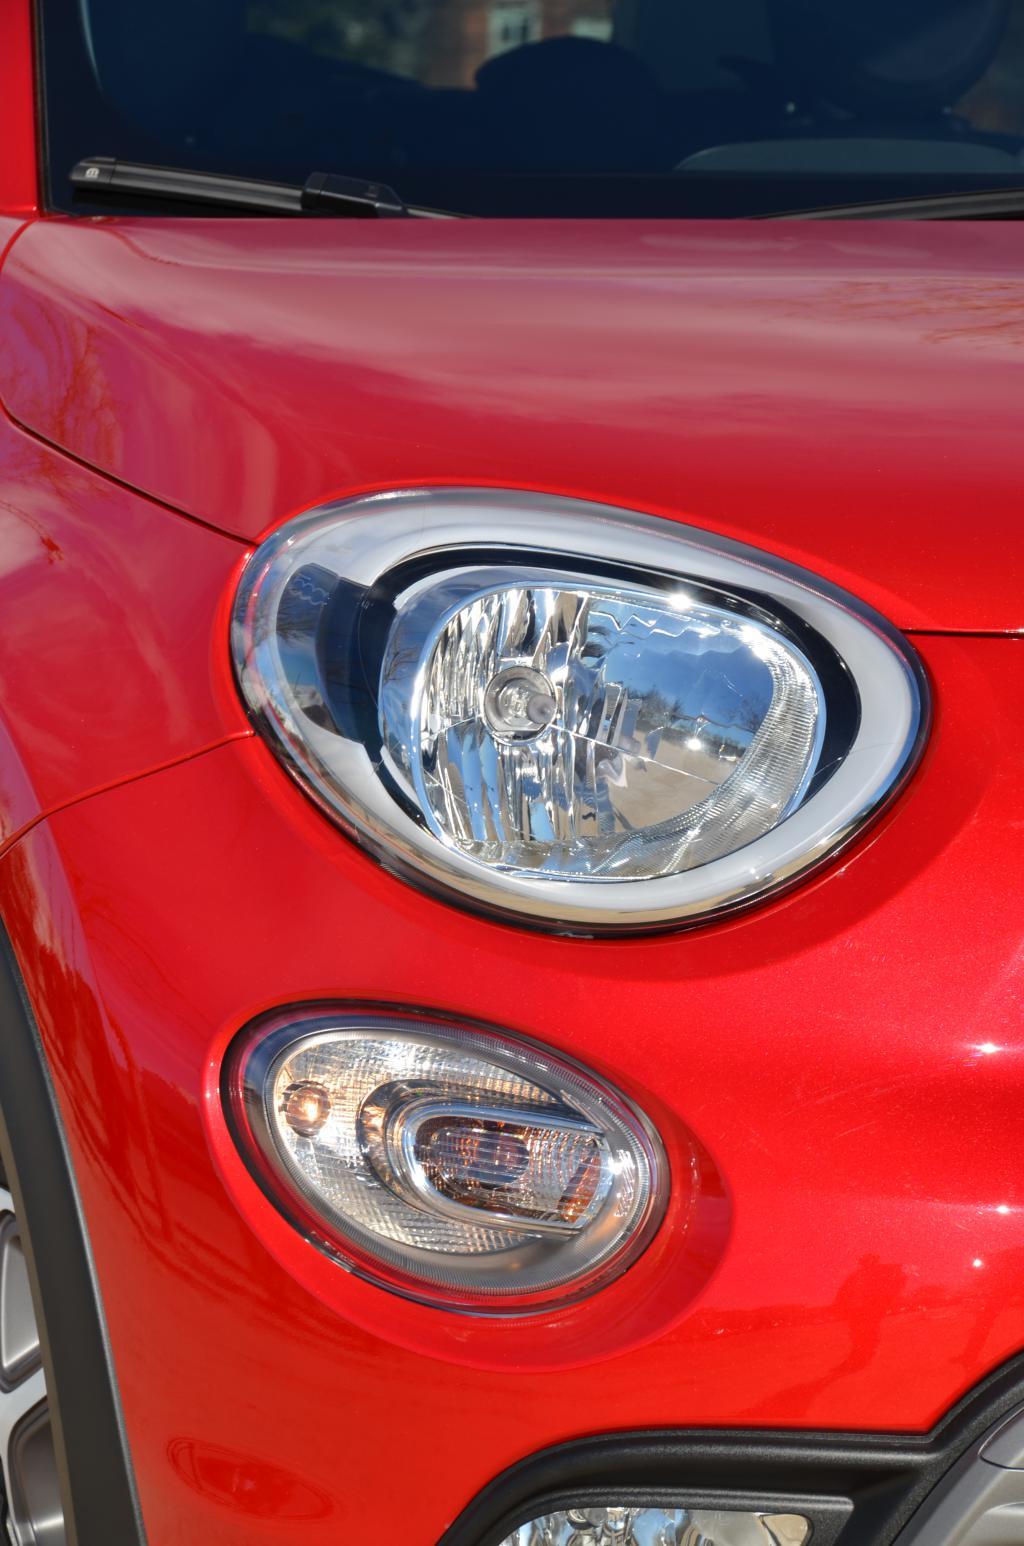 Fiat 500x Vs Jeep Renegade Revista De Coches Previousnext